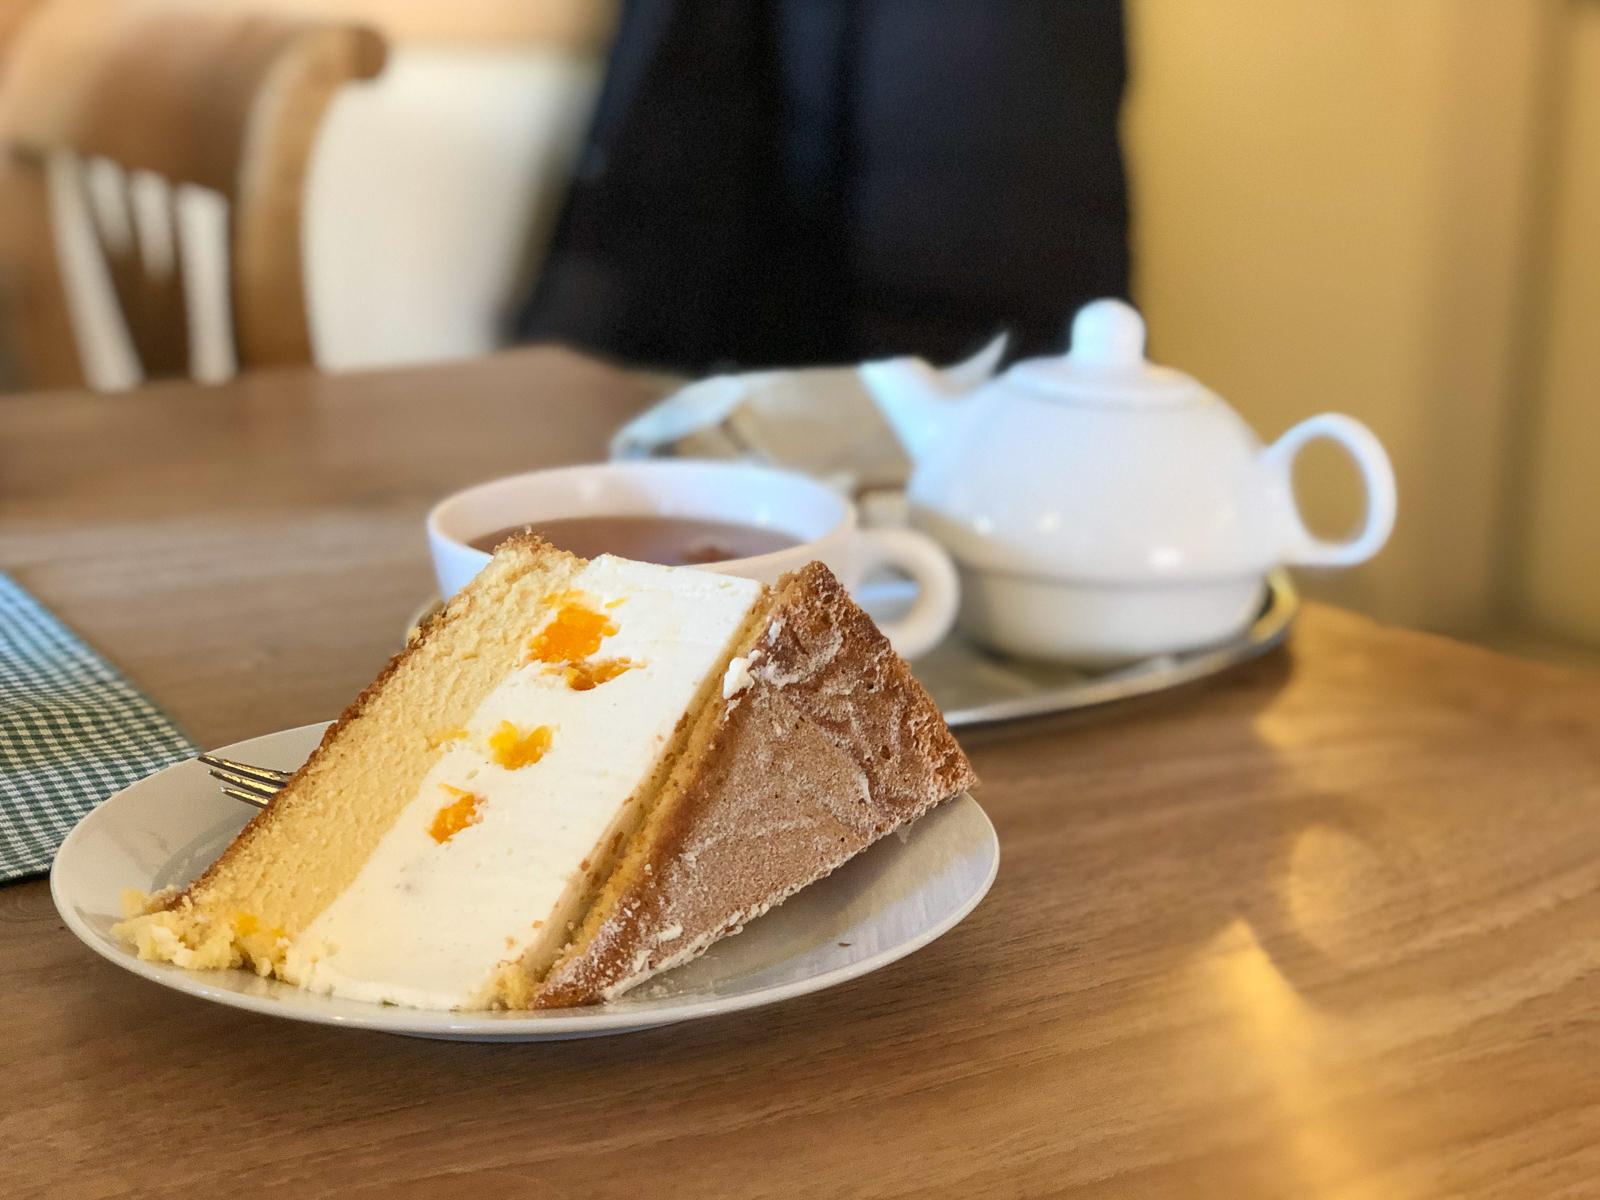 Wintschgers Erb, Landcafé, Bauernhofcafé, Hofcafé, Krefeld, Tönisvorst